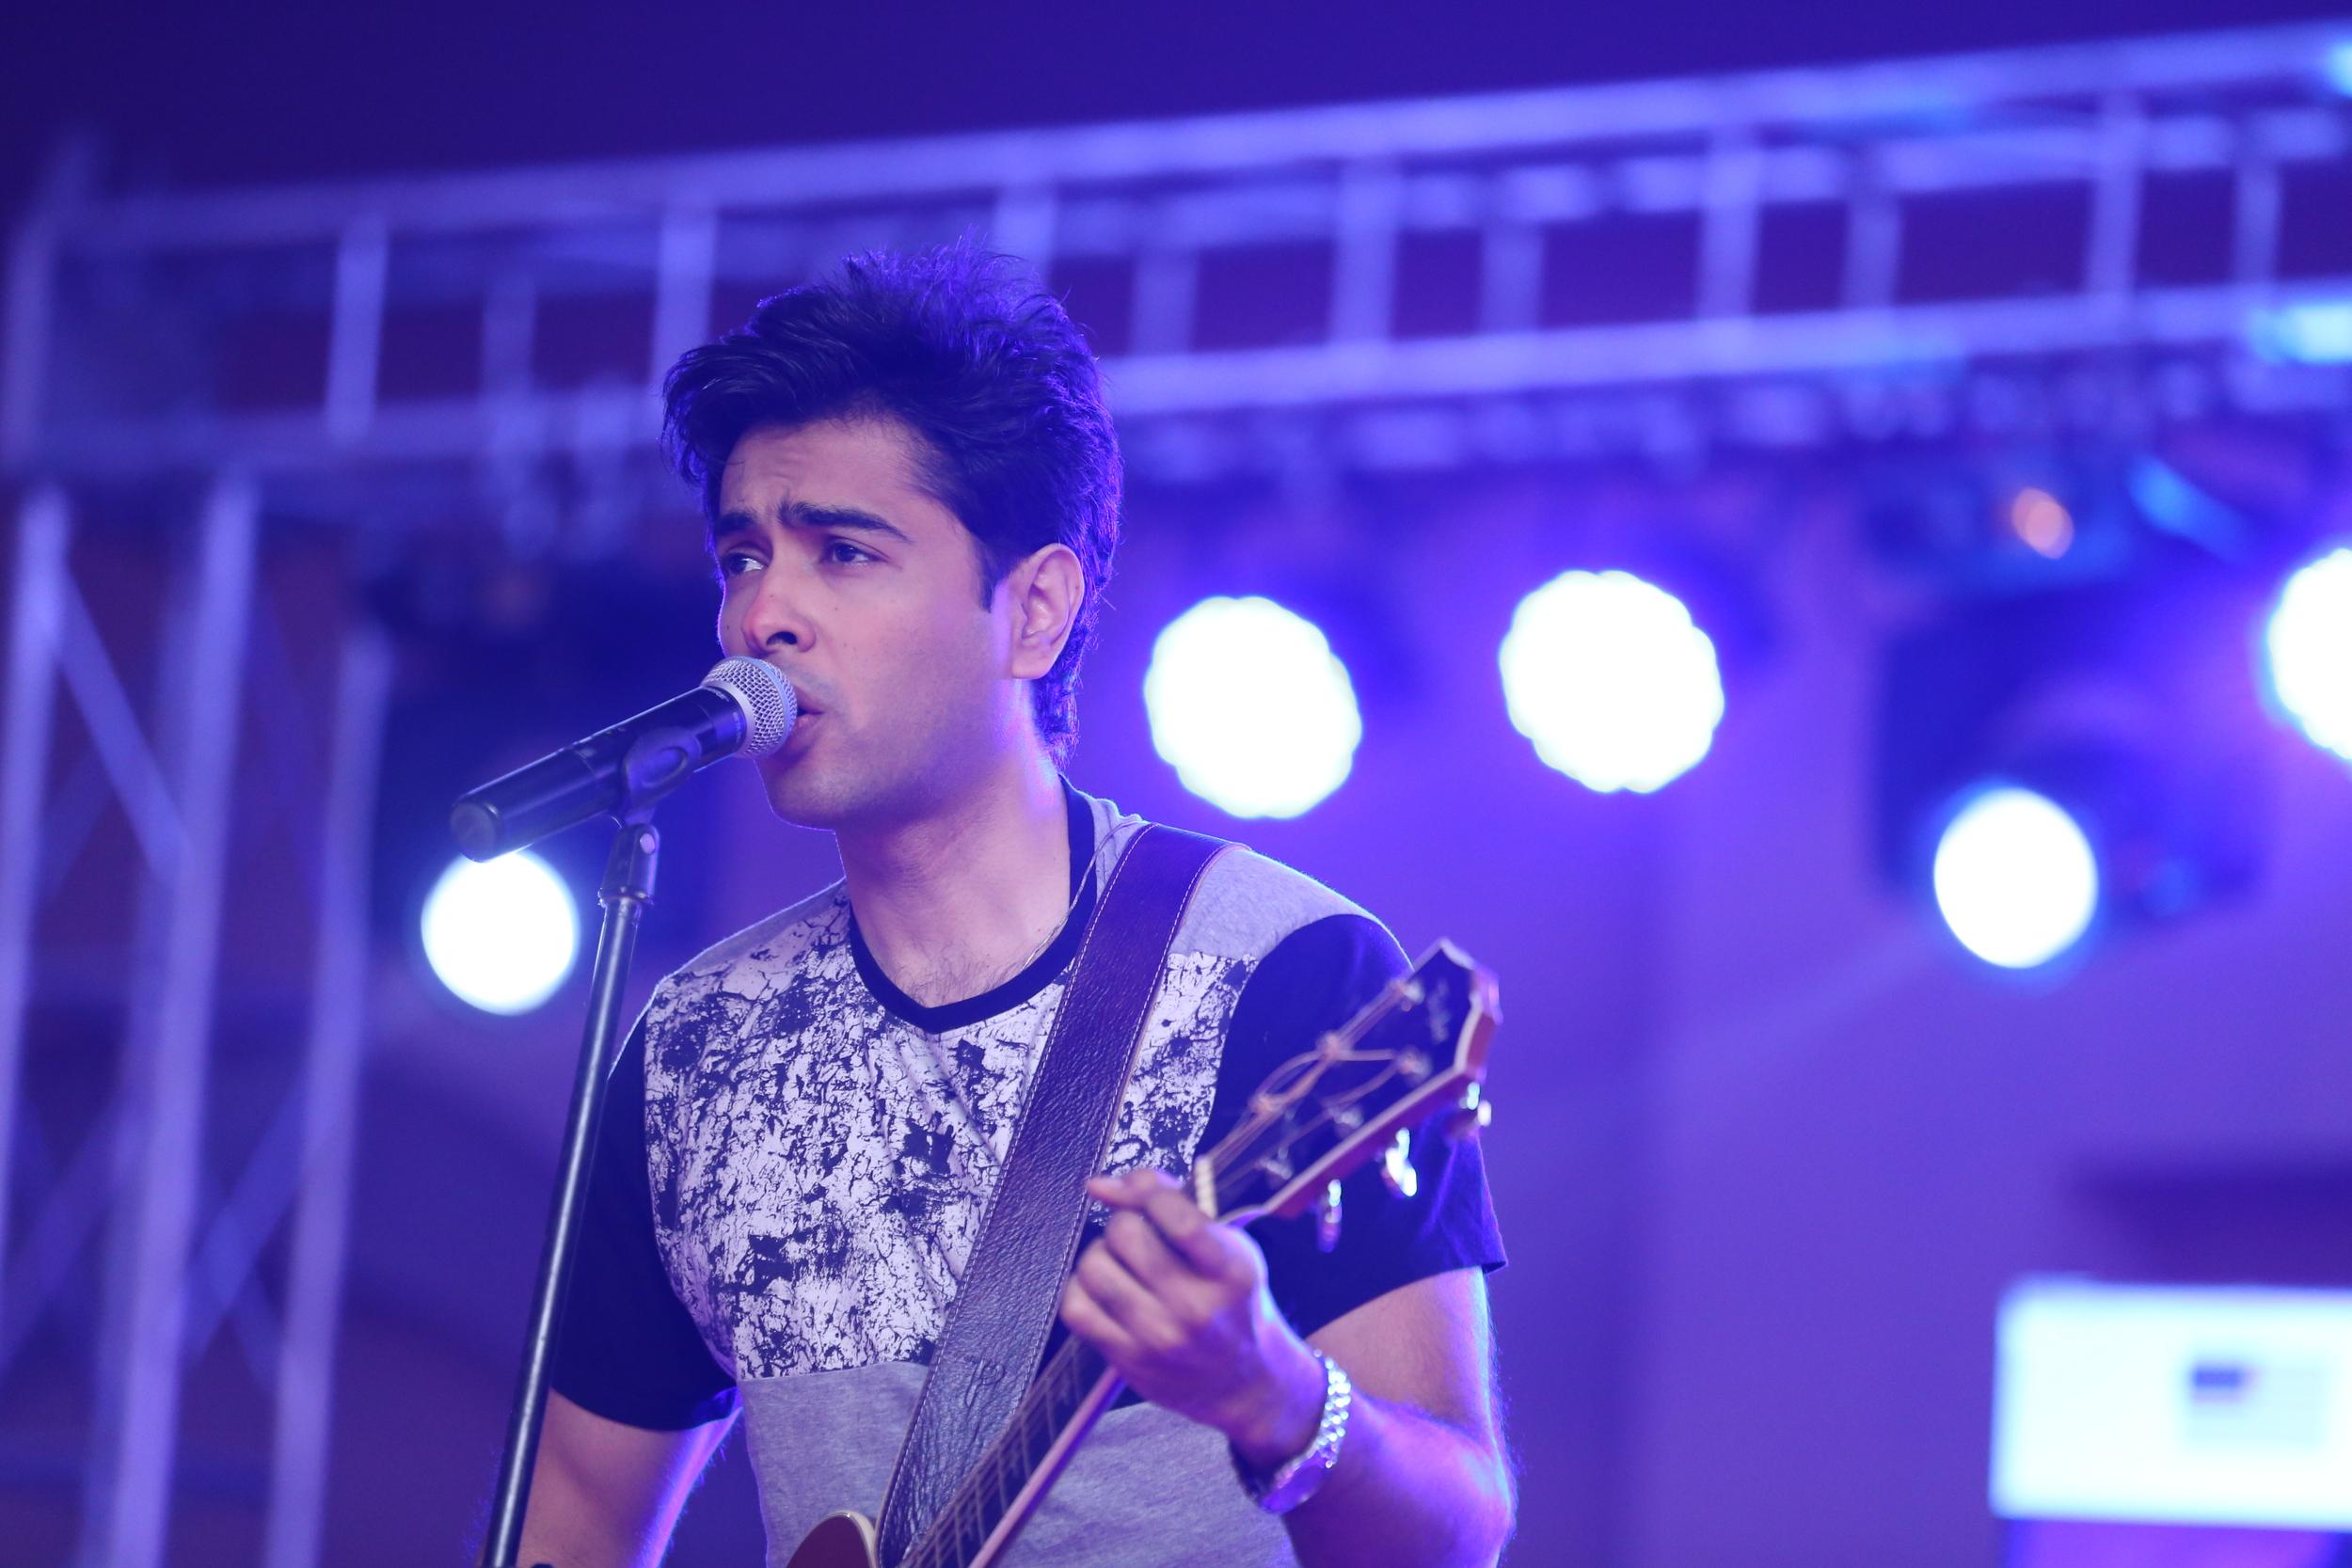 musician performing